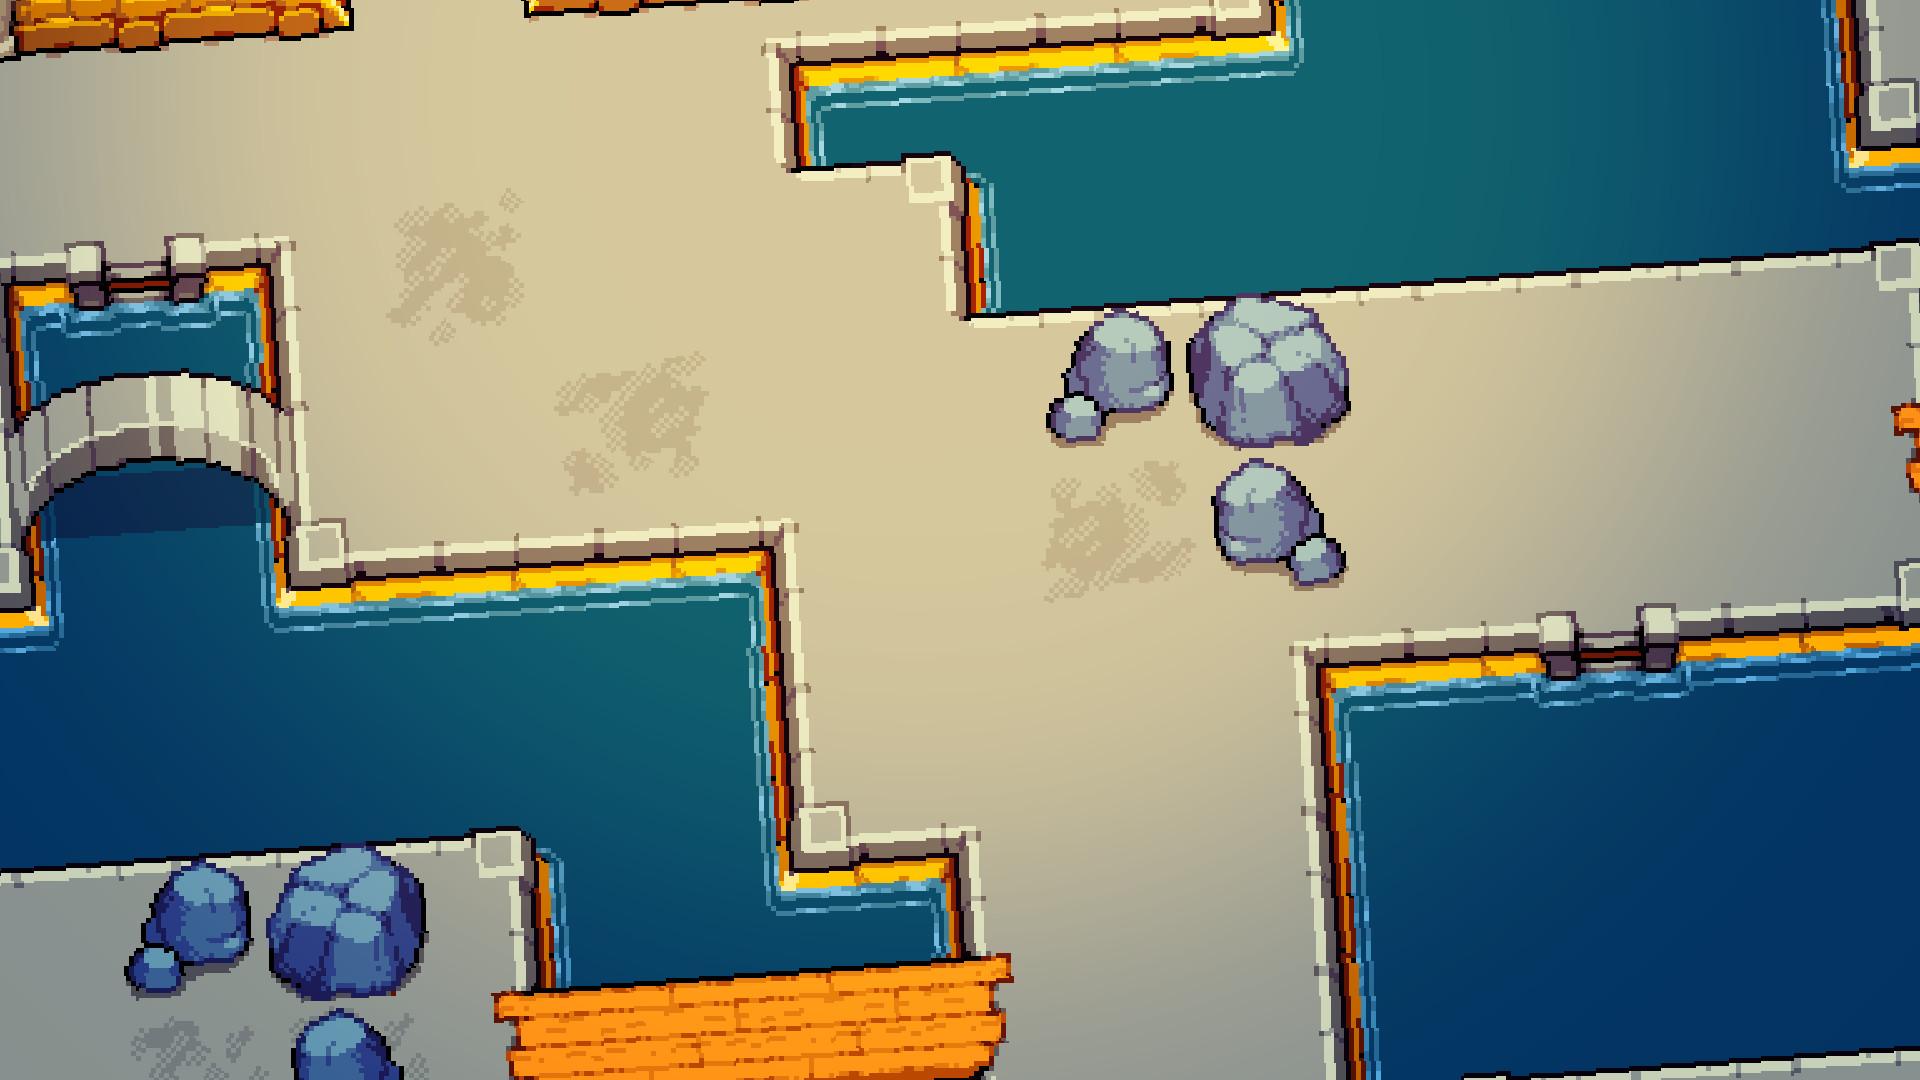 vine's dungeon tileset by Vine | GameMaker: Marketplace